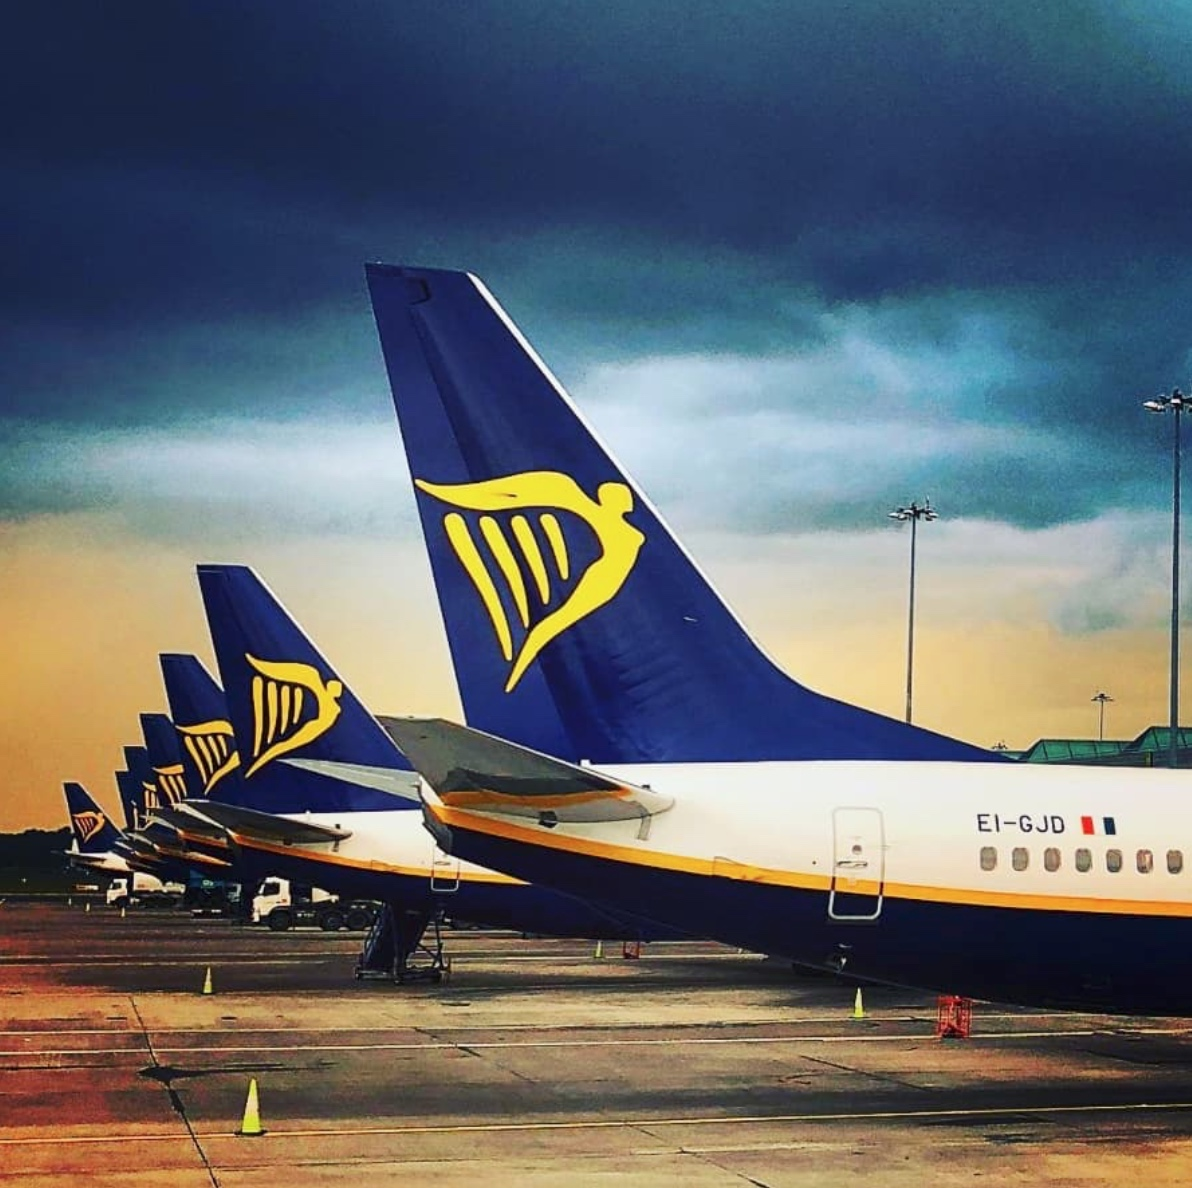 Ryanair to cut flights by up to 40 per cent due to coronavirus - ITV News